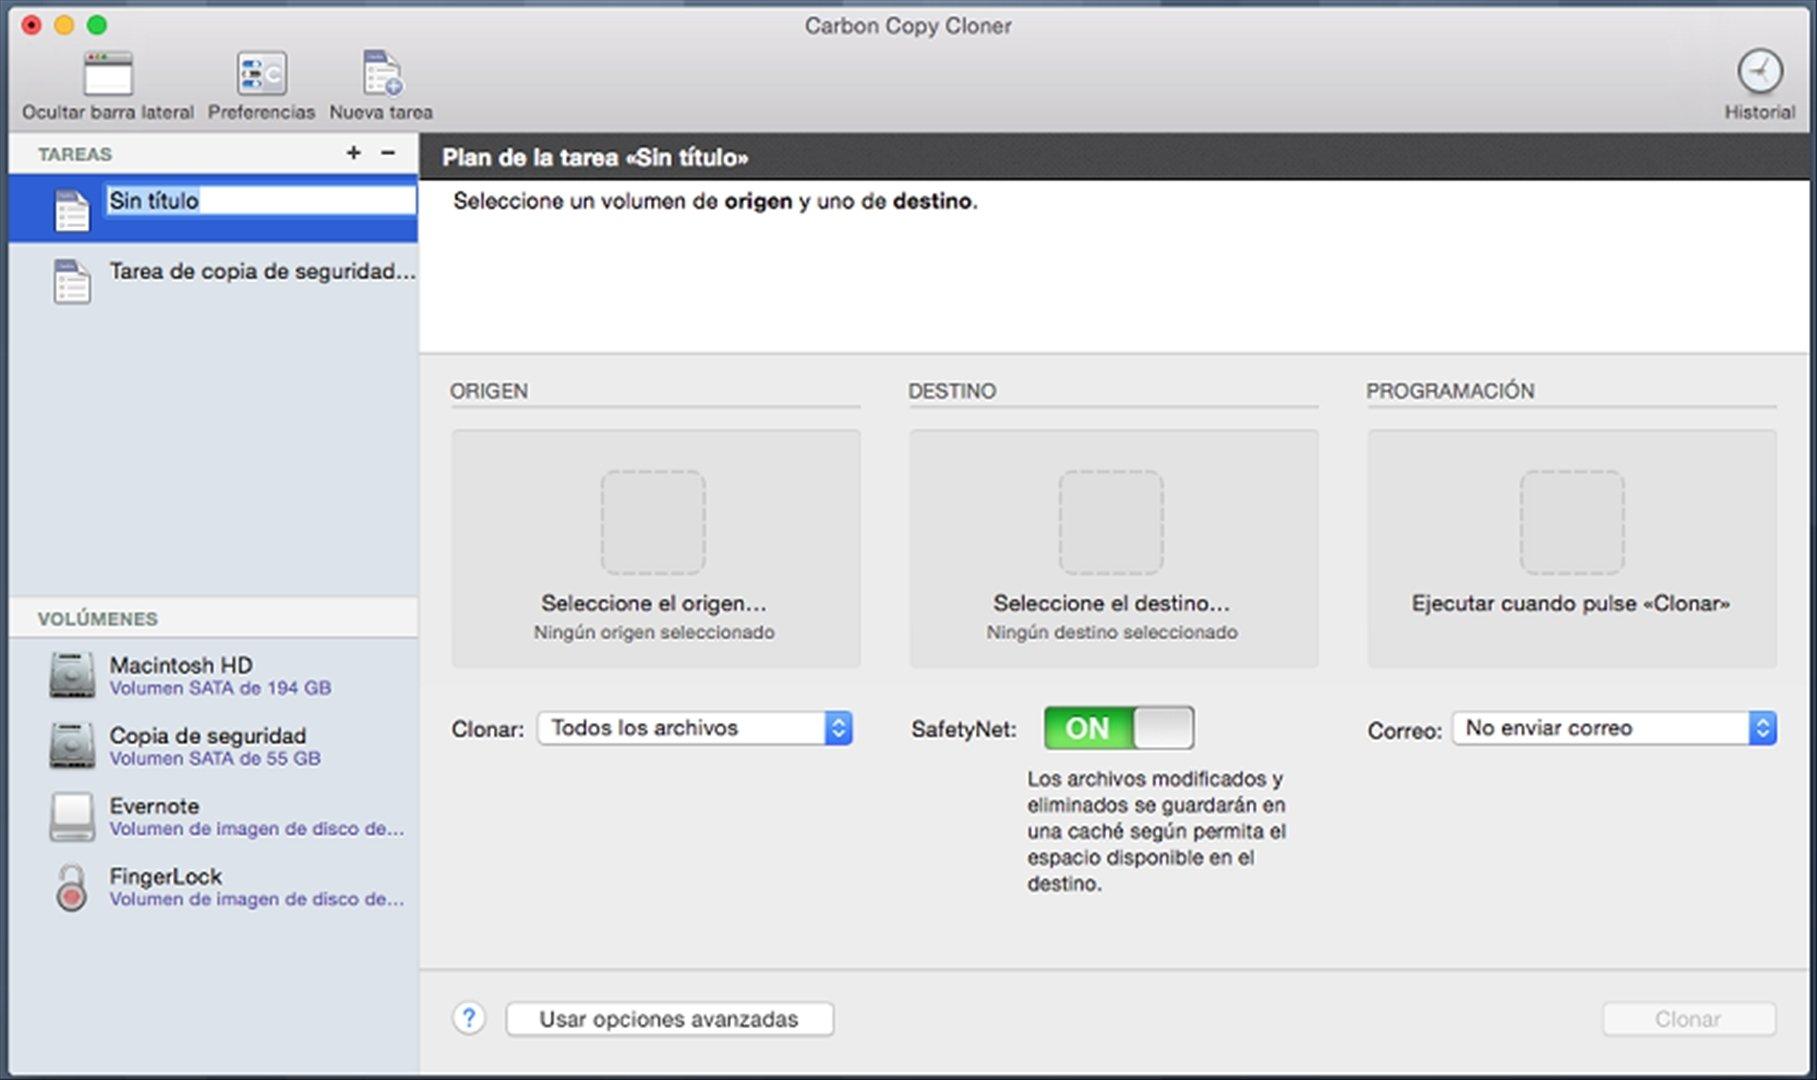 carbon copy cloner 5 1 6 mac用ダウンロード無料